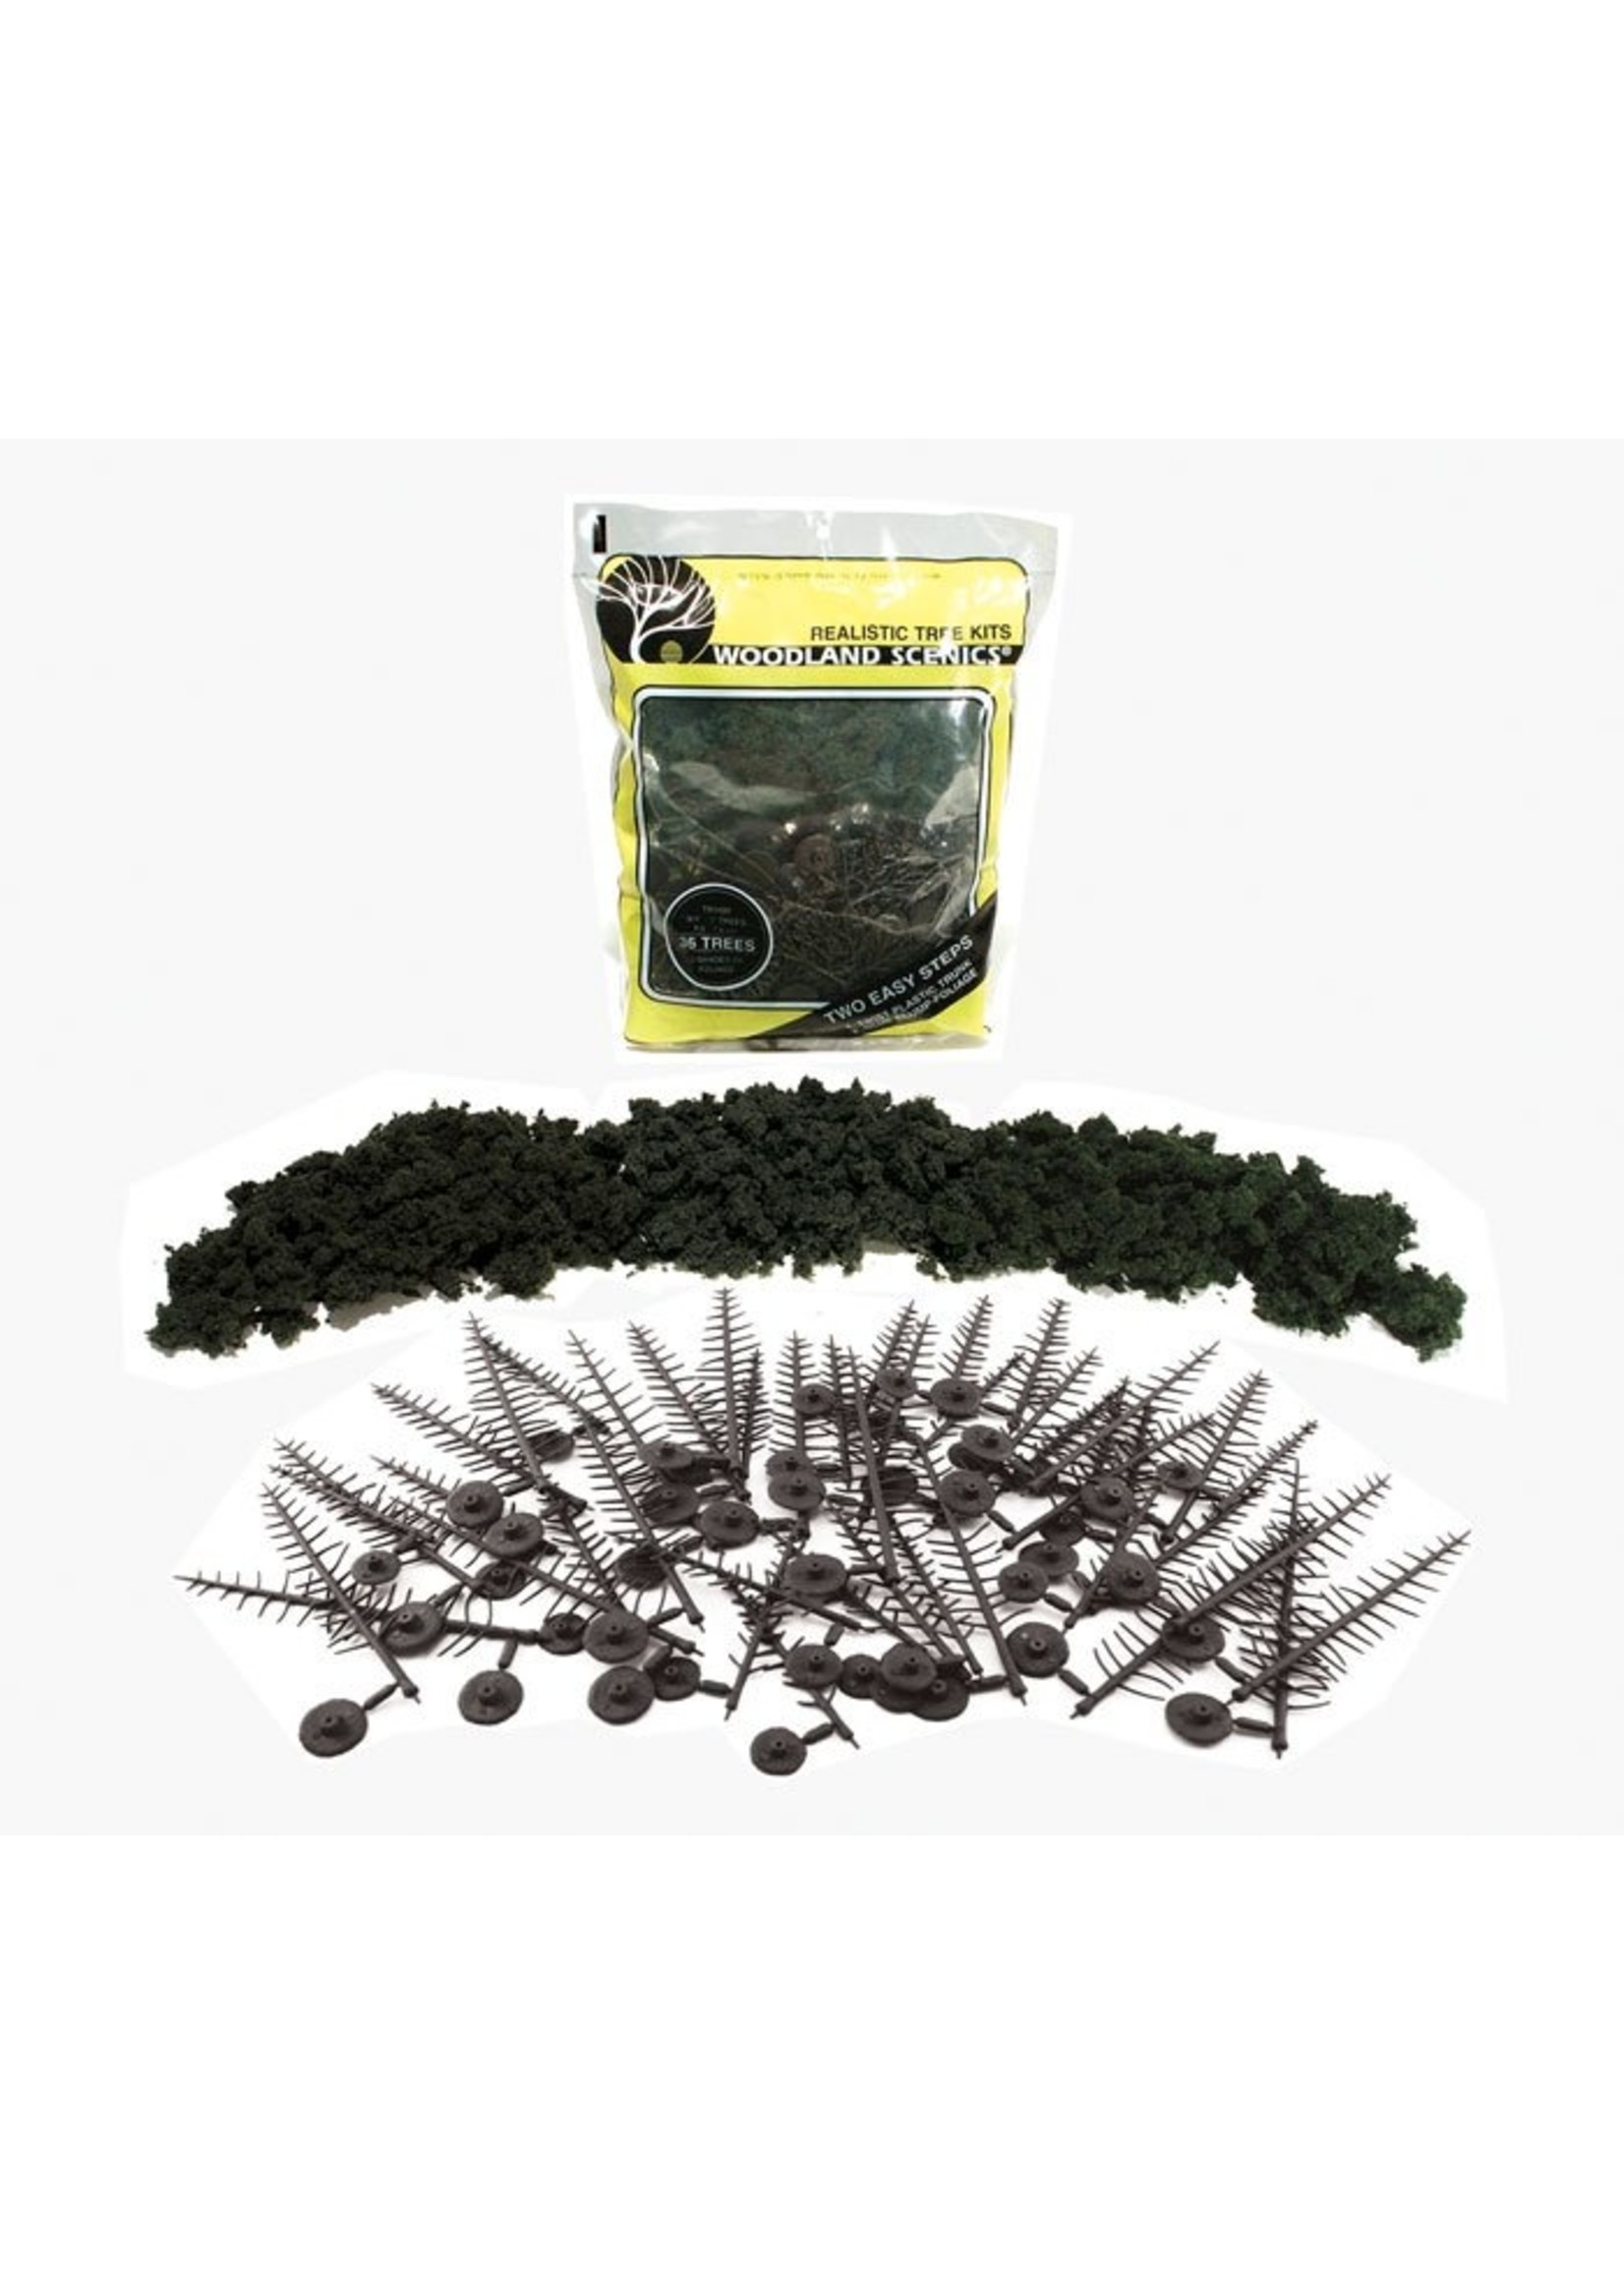 Conifer Tree Kit, 2-1/4''-4'' (24)